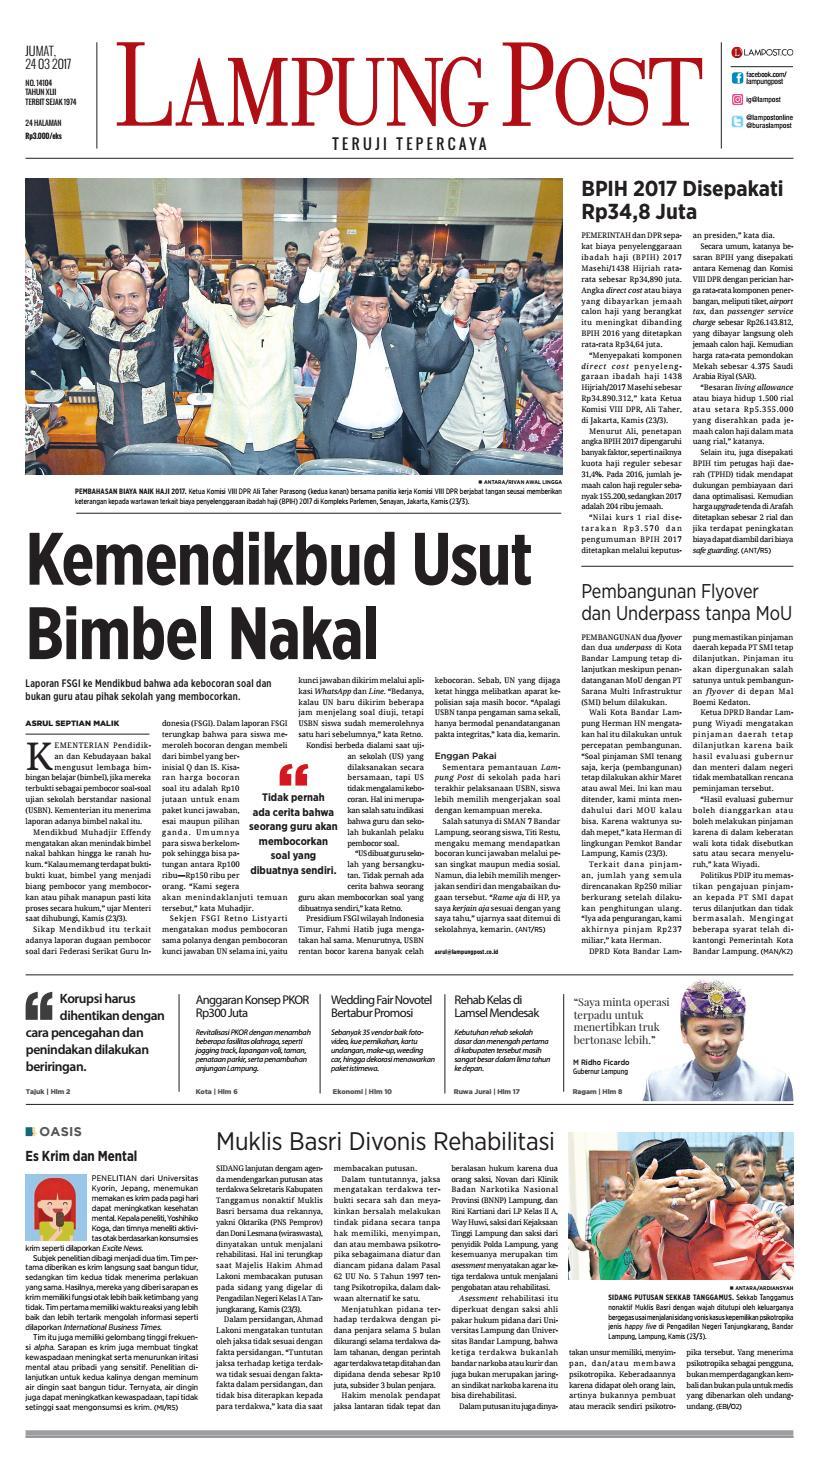 Lampung Post Jumat 24 Maret 2017 By Issuu Emba Jeans Bs08b1 Celana Denim Pria Warna Jet Black Hitam 38